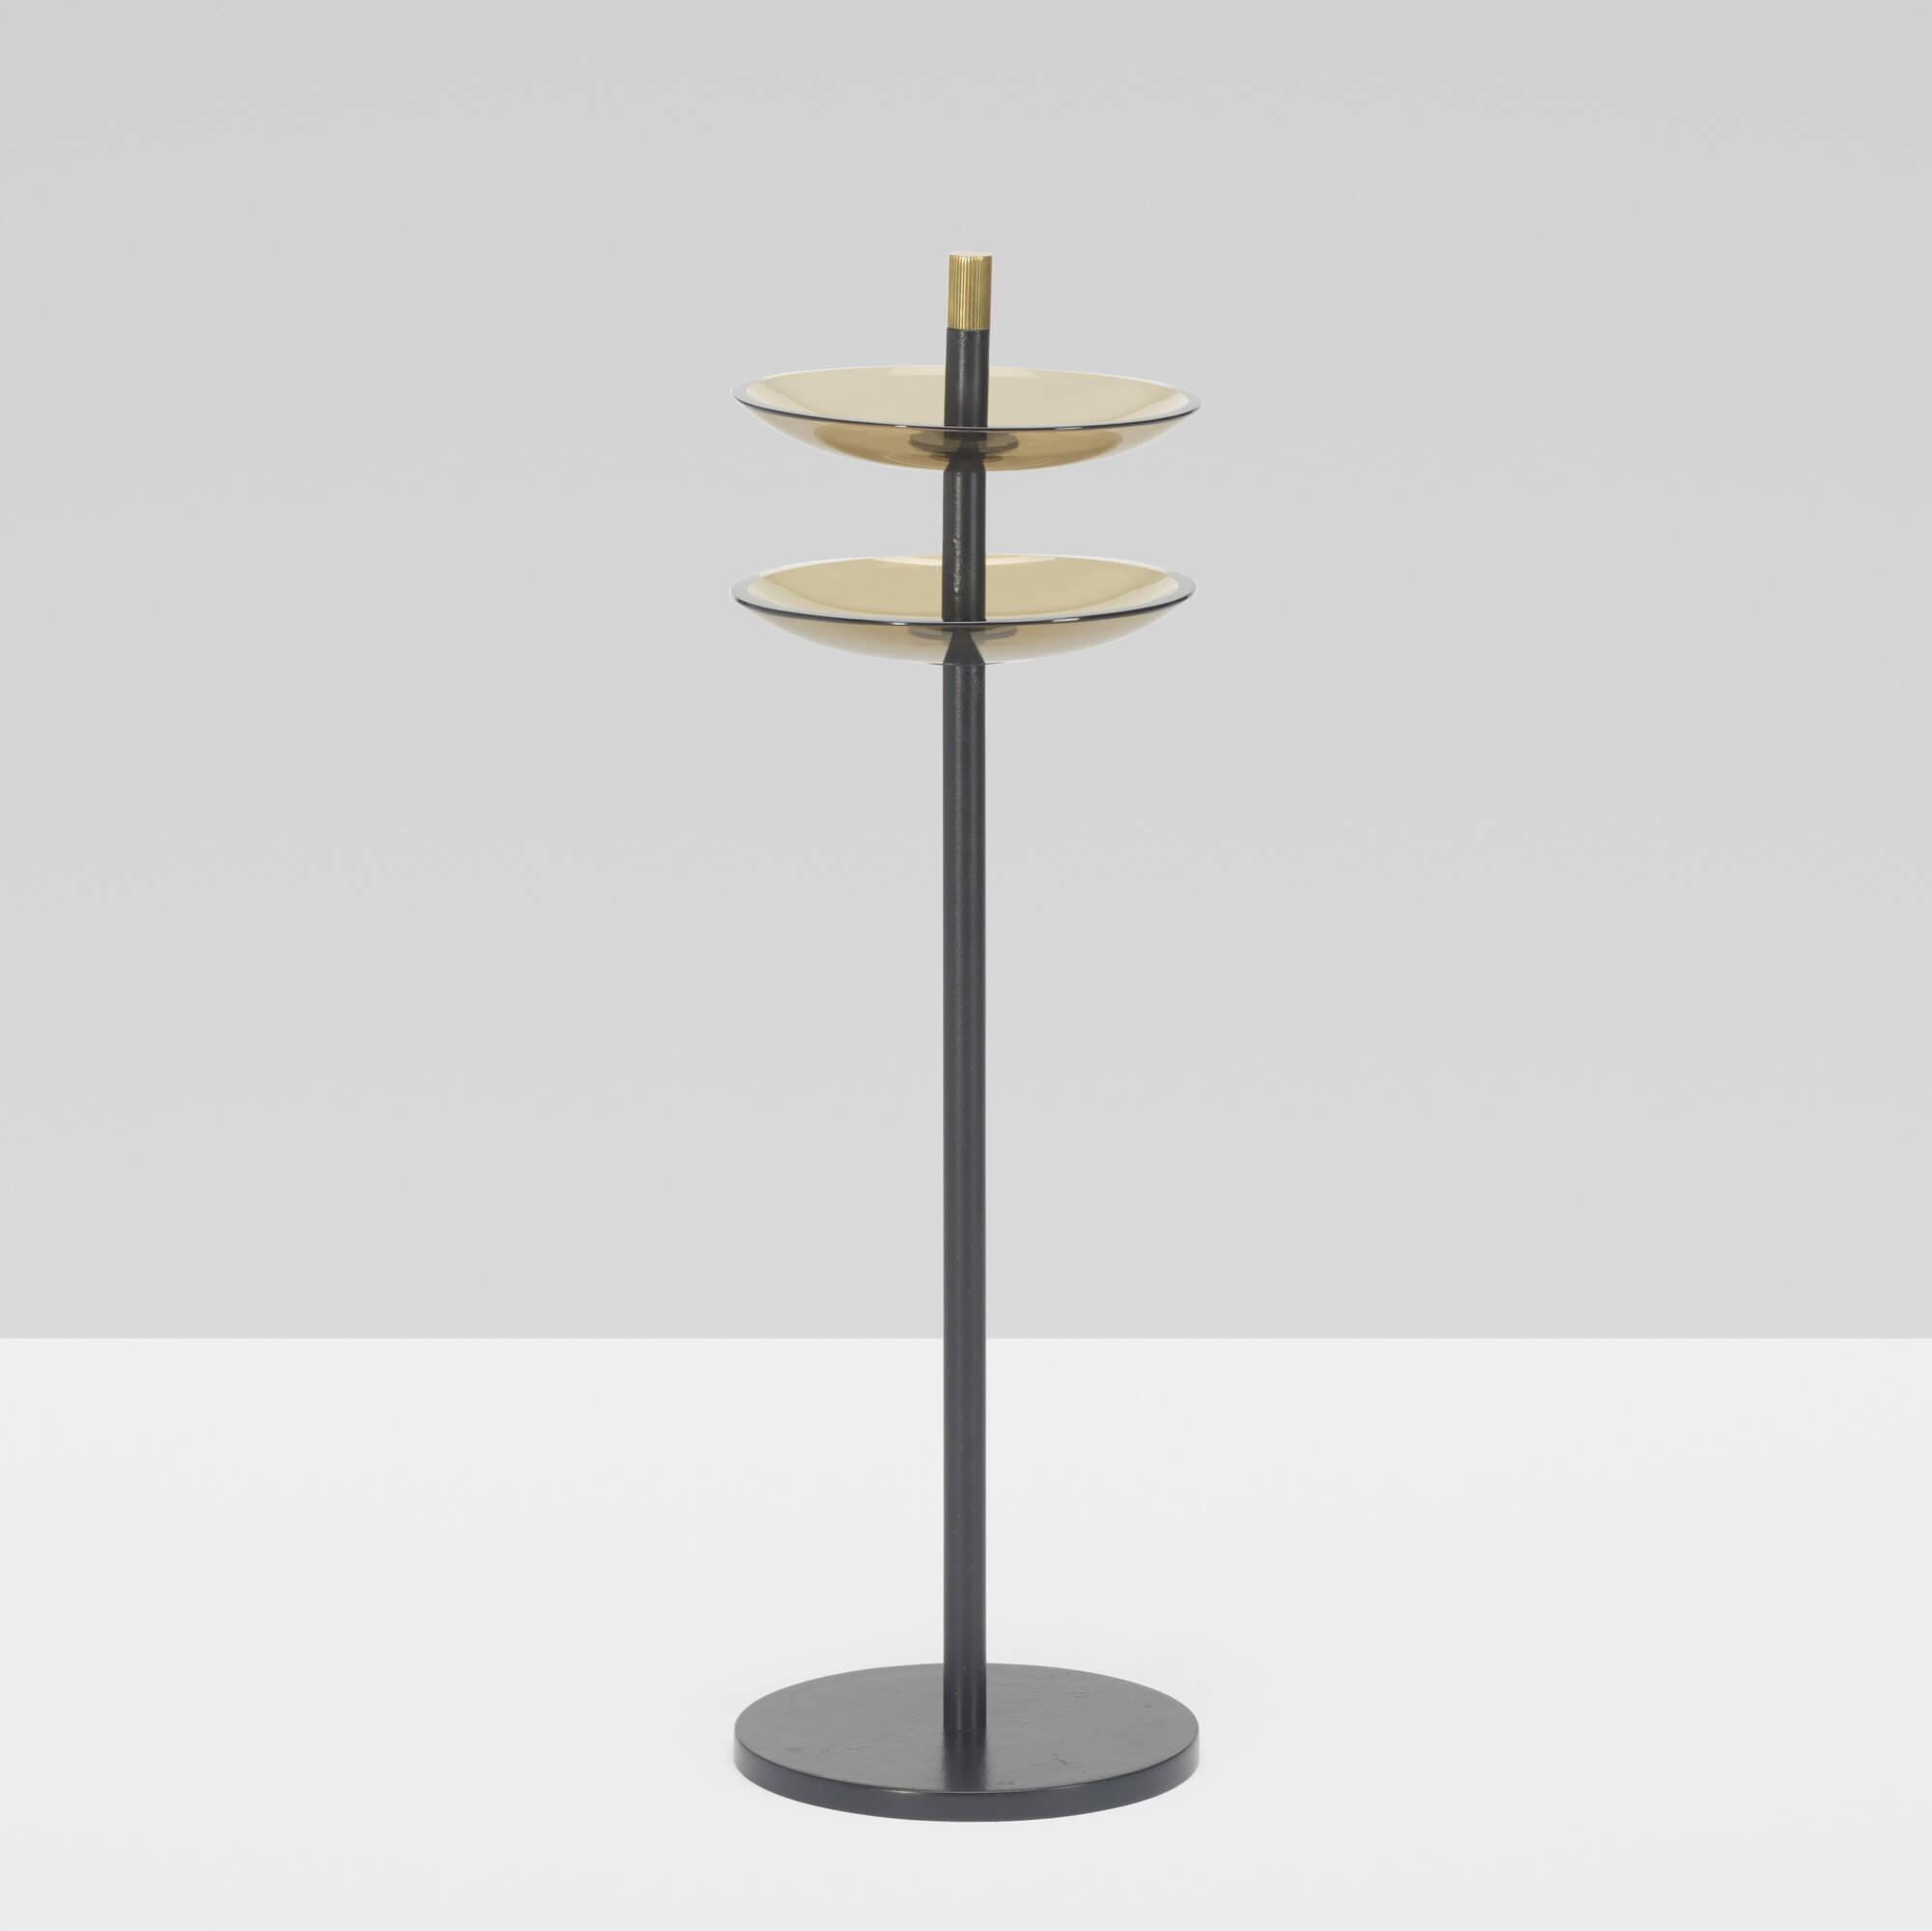 188: Fontana Arte / ash stand, model 2087 (1 of 2)